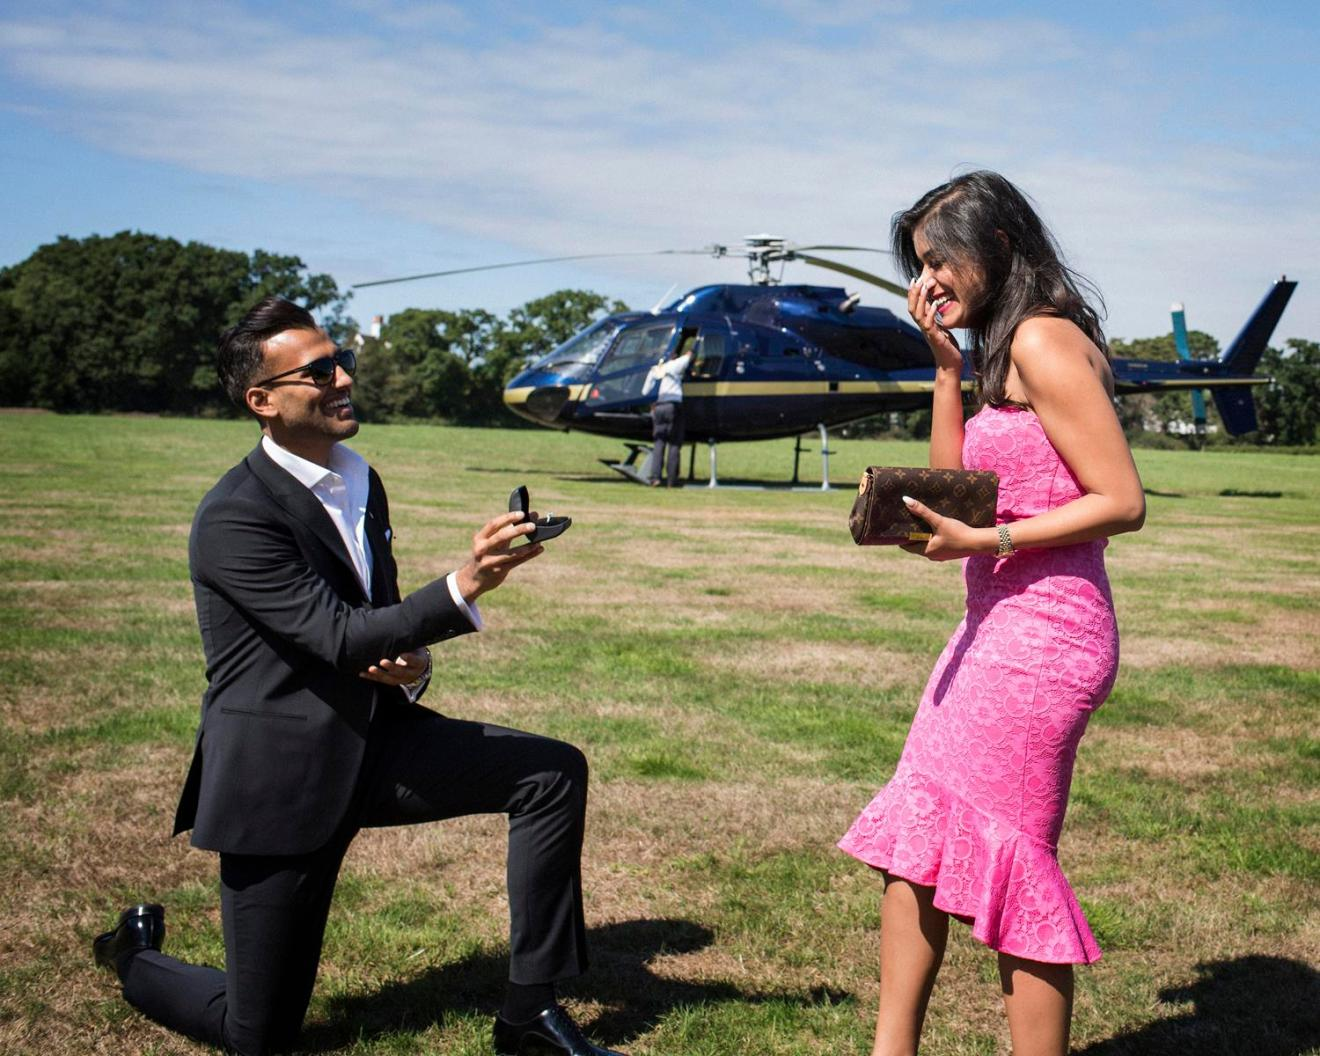 Rimal & Shivali   Dreamy Proposal ideas   Indian couples   Big gestures   Pre Wedding photo shoot ideas  